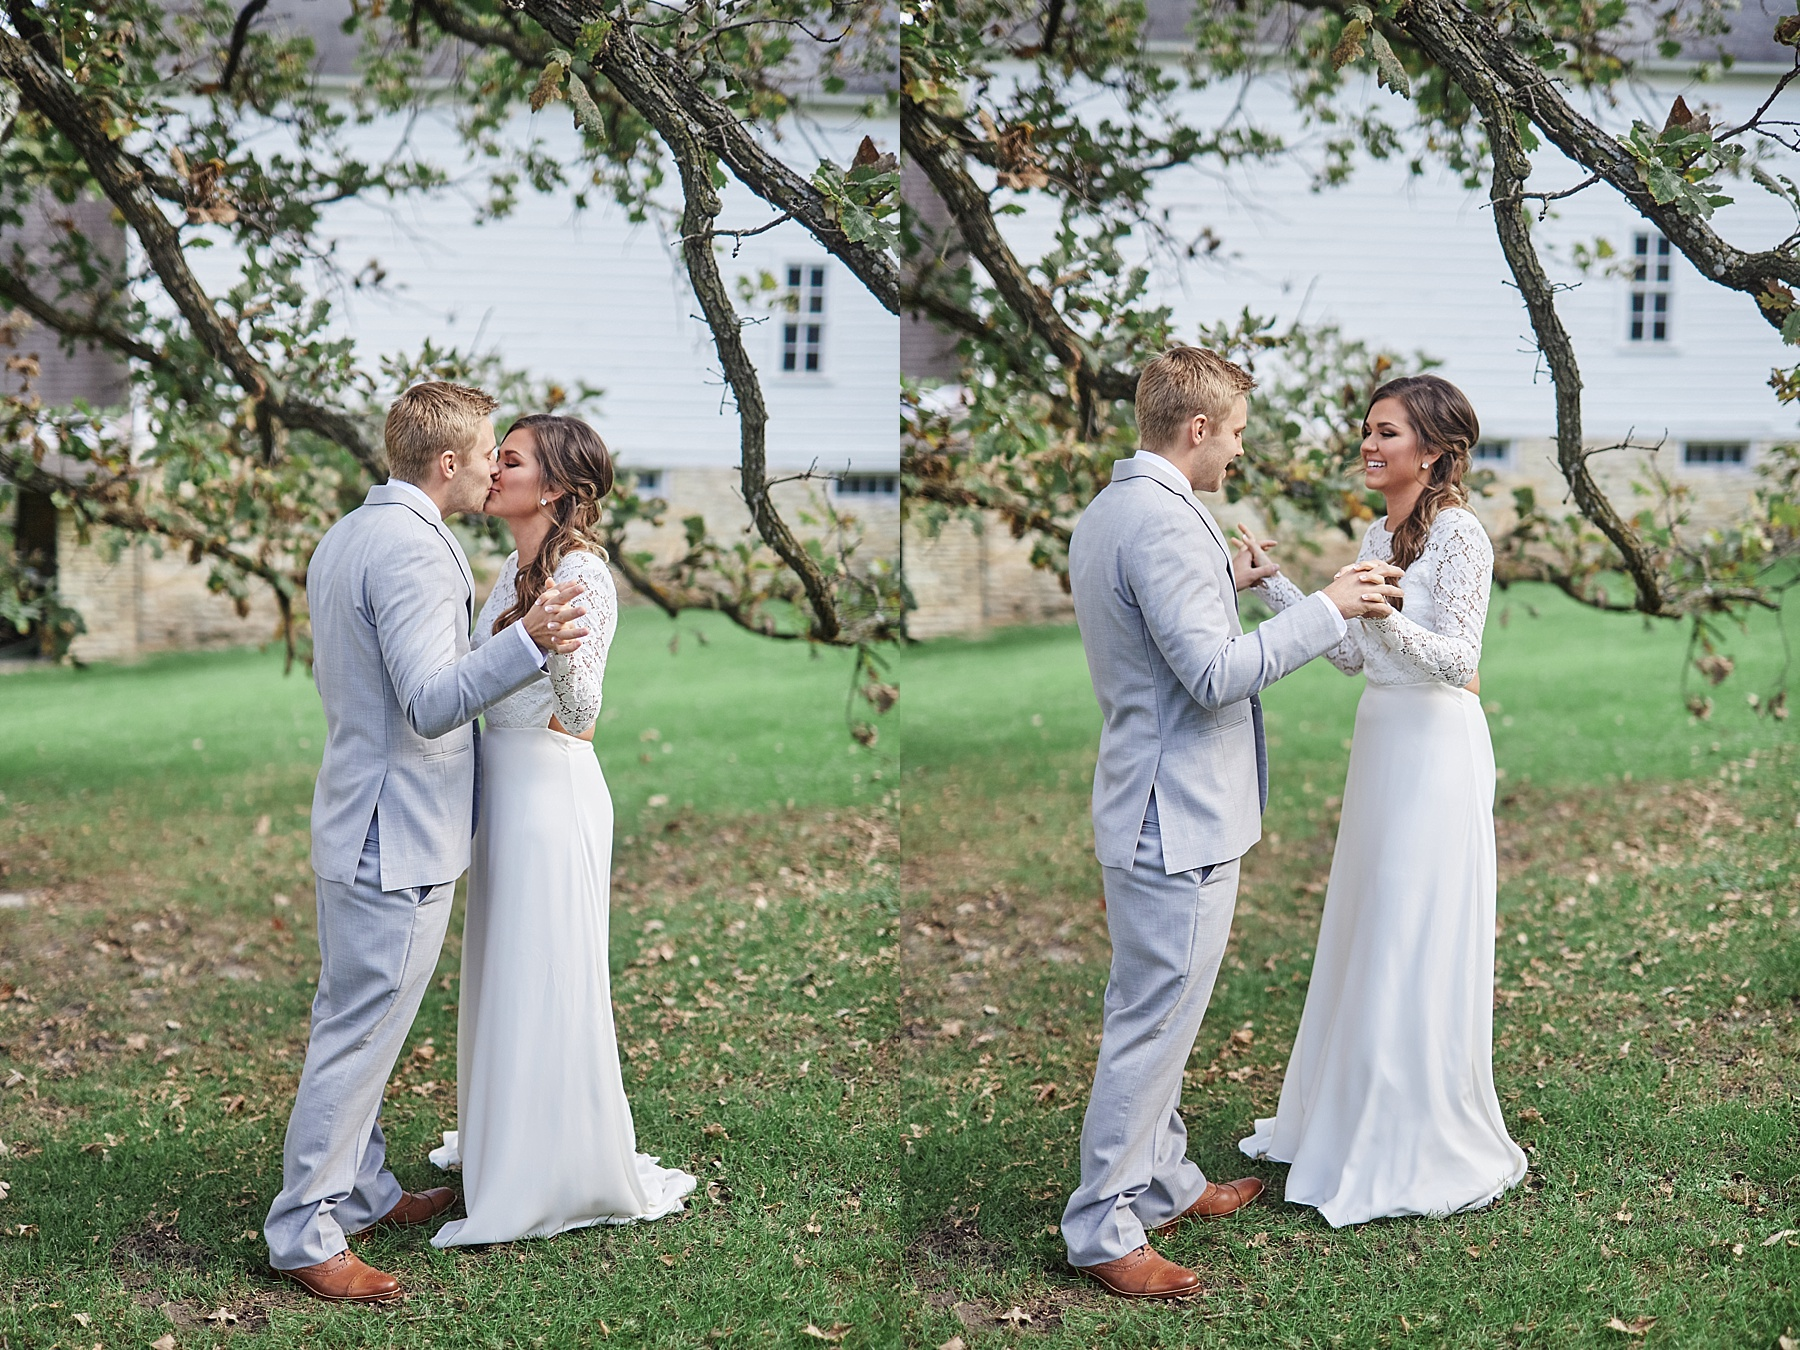 Maywood-Stone-Barn-Wedding-Rochester-Minnesota-Perry-James-Photo_0584.jpg